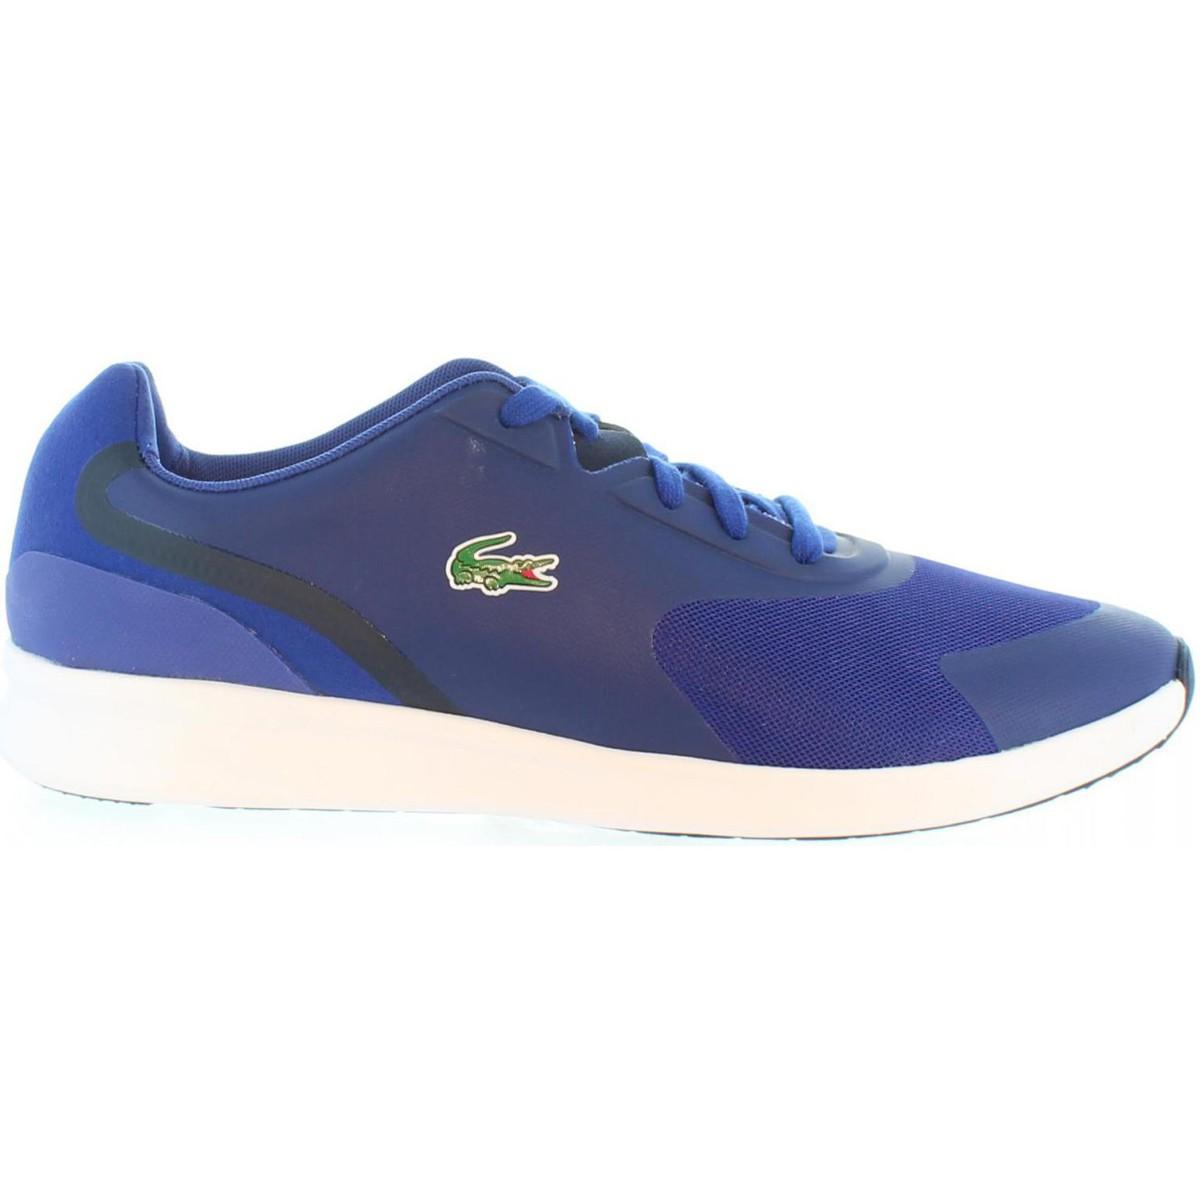 Basket Lacoste 32SPM0025 LTR01 Azul